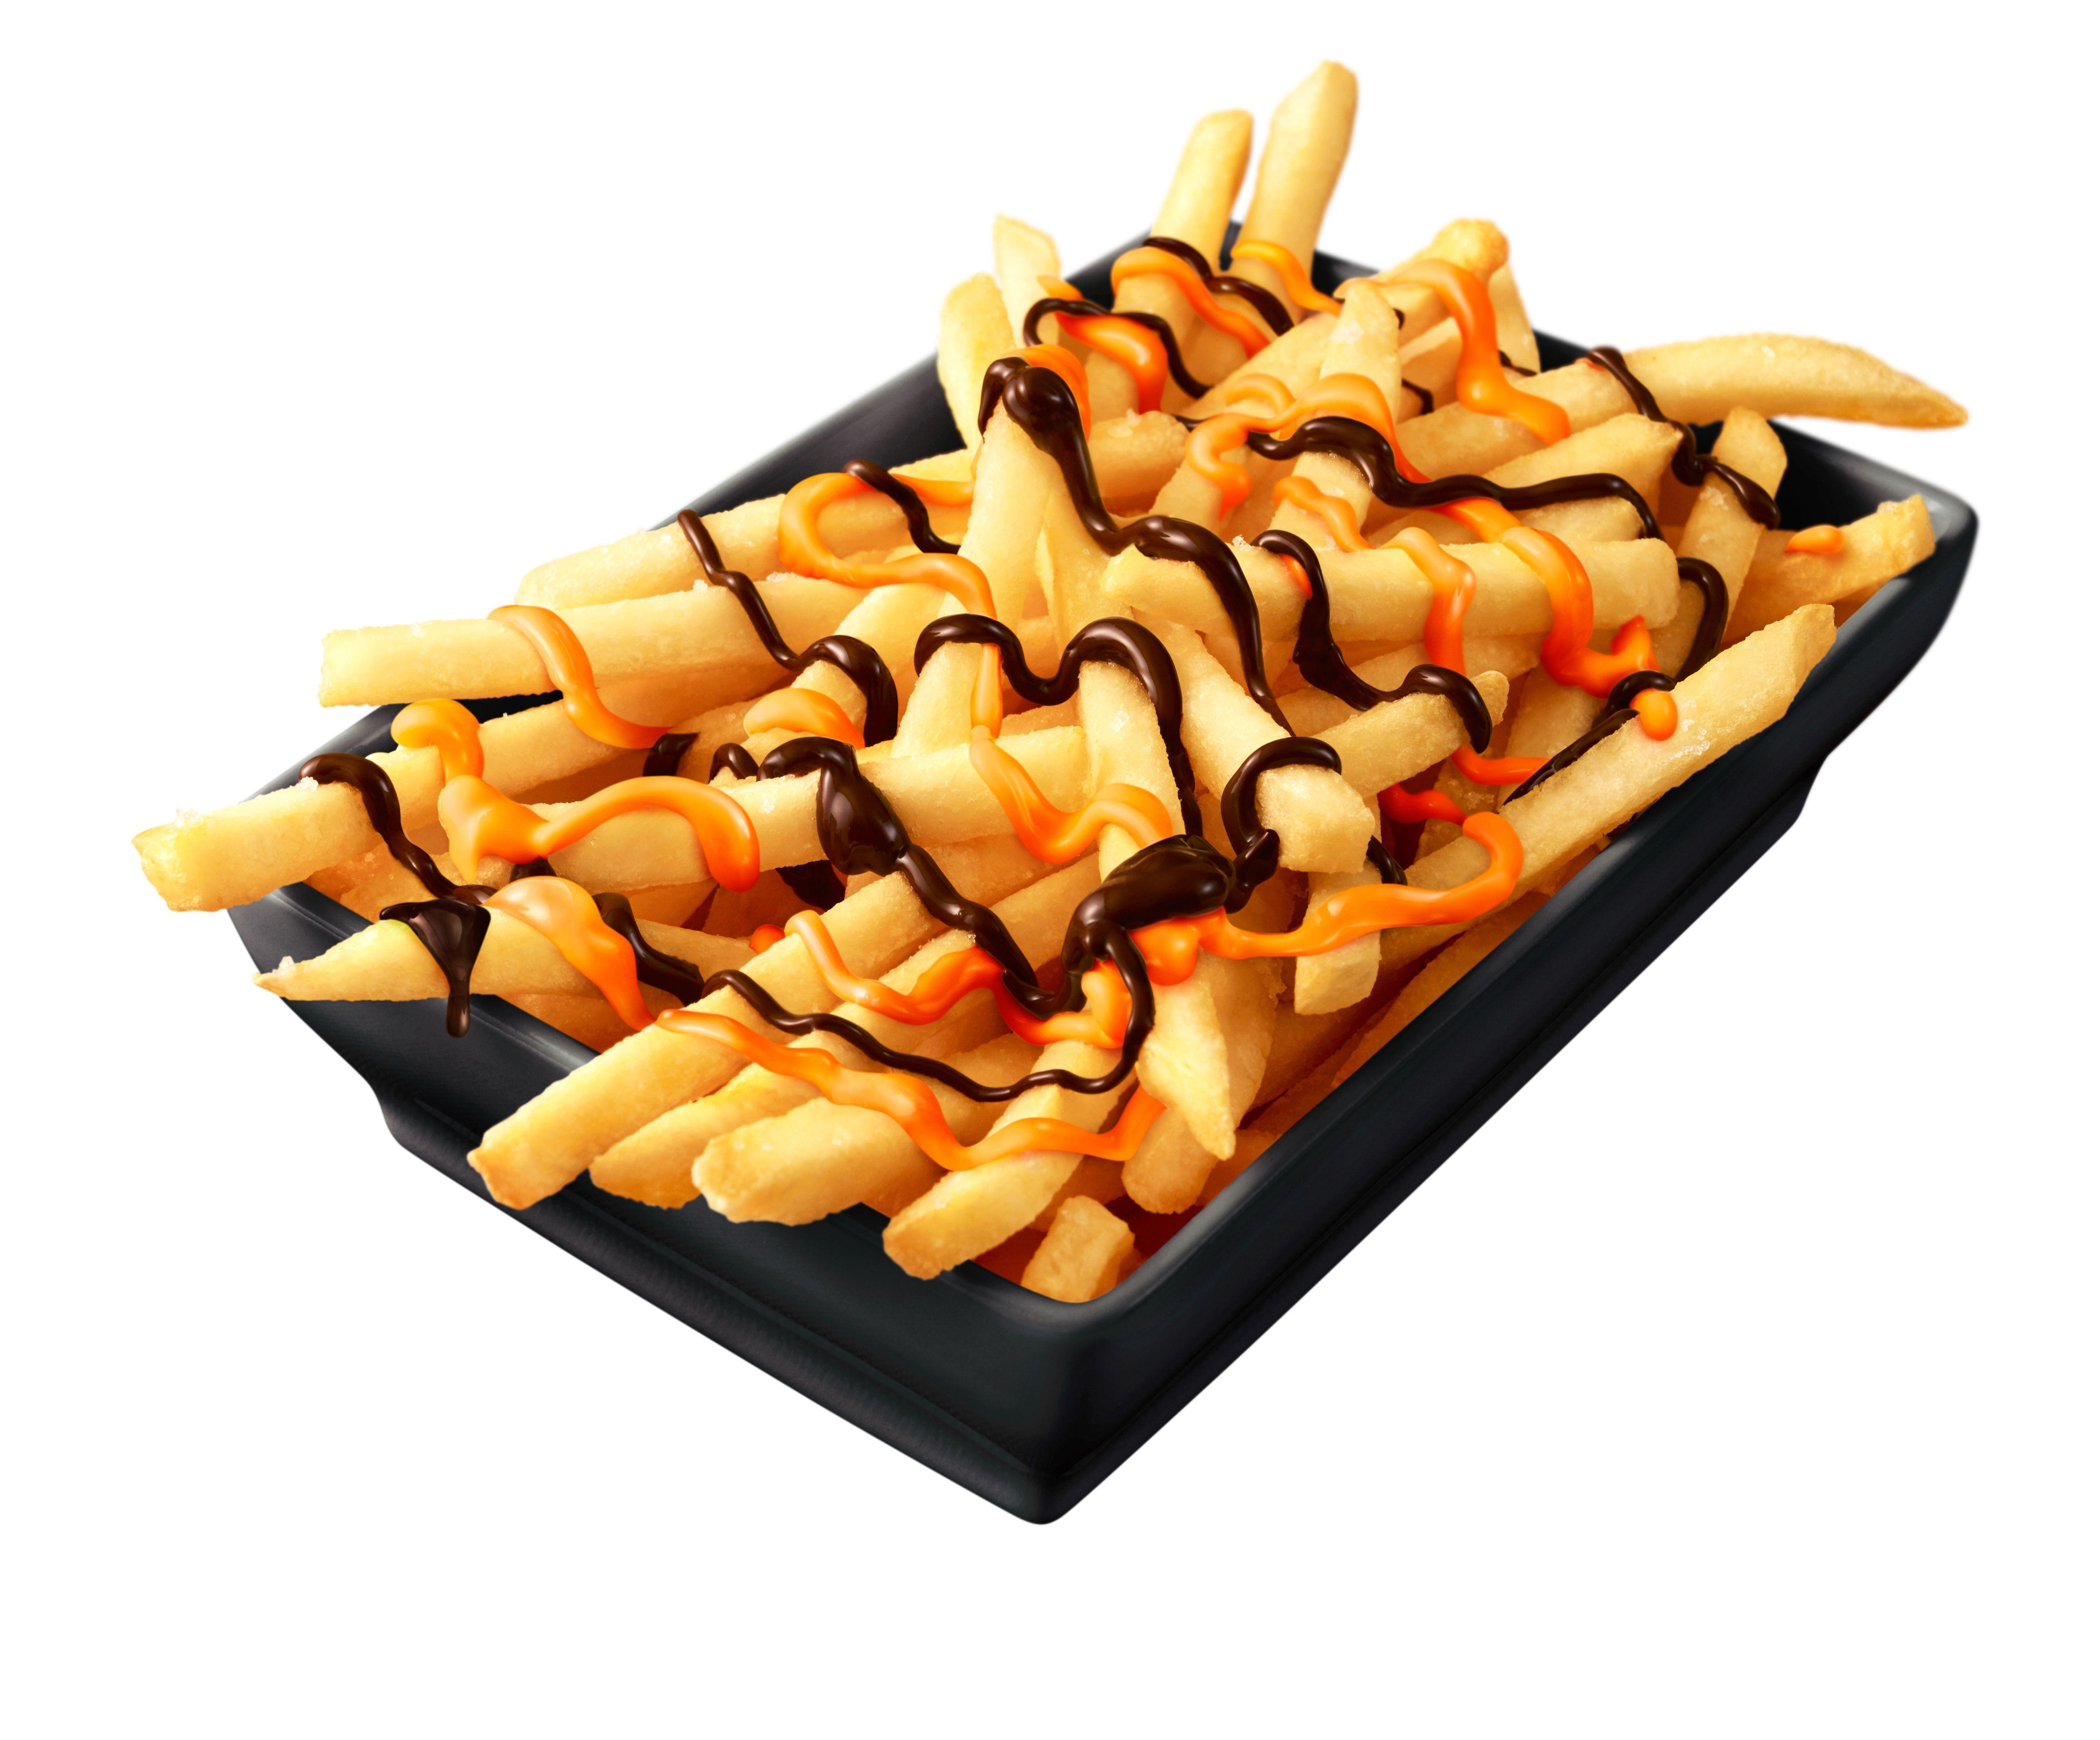 McDonalds Is Launching Pumpkin Chocolate Fries